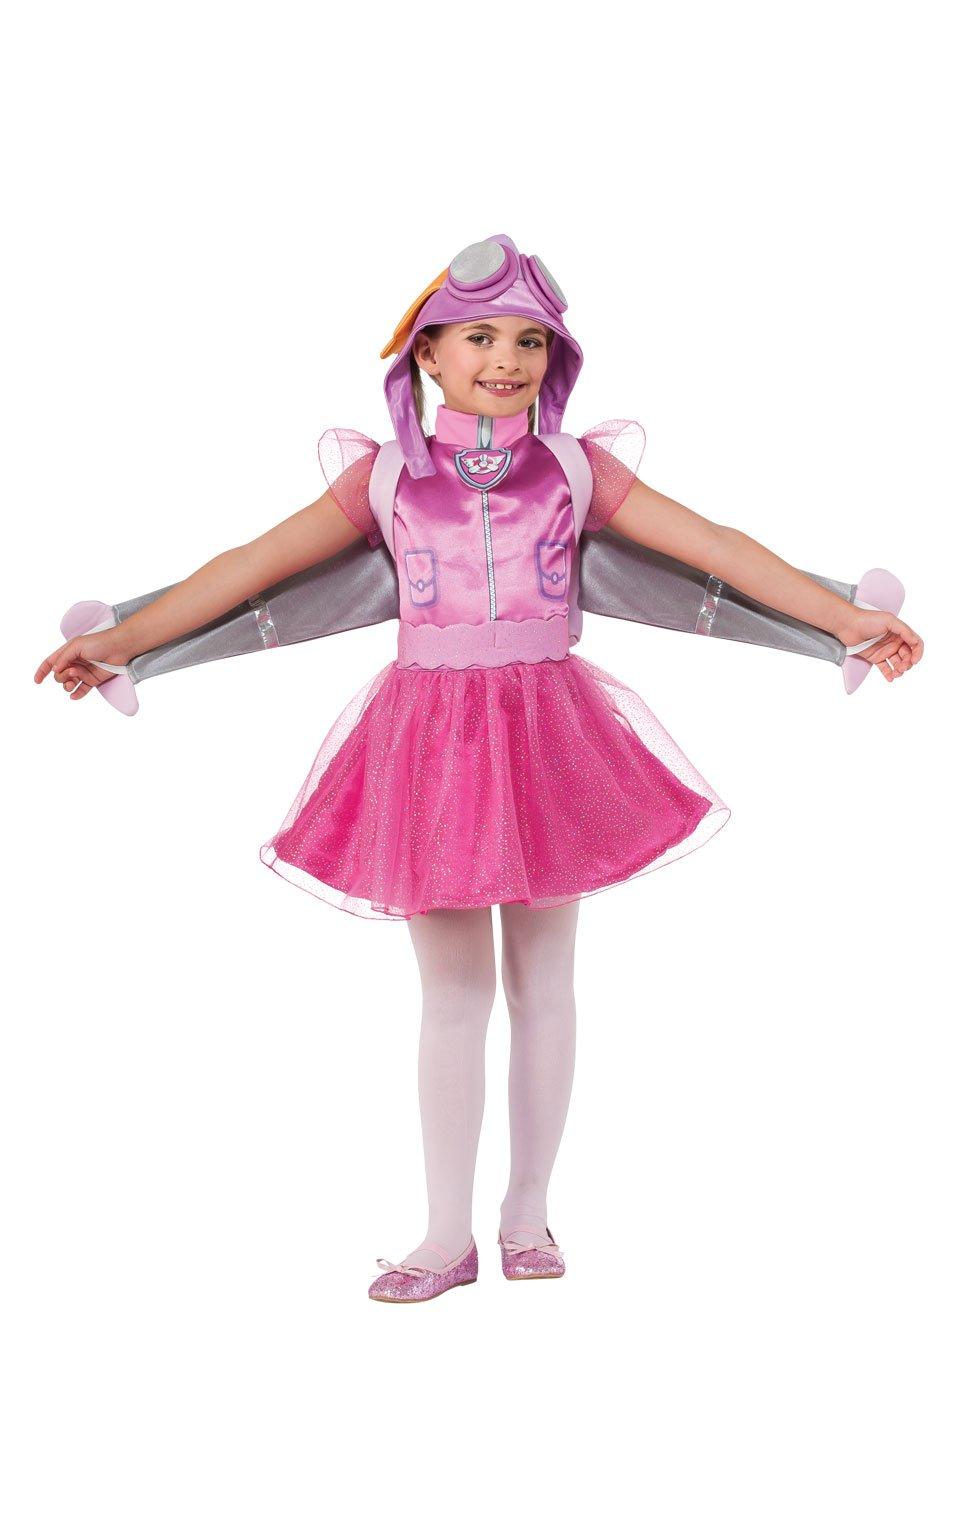 c3daa66cb04c Best Rated in Kids    Babies  Costumes   Accessories   Helpful ...